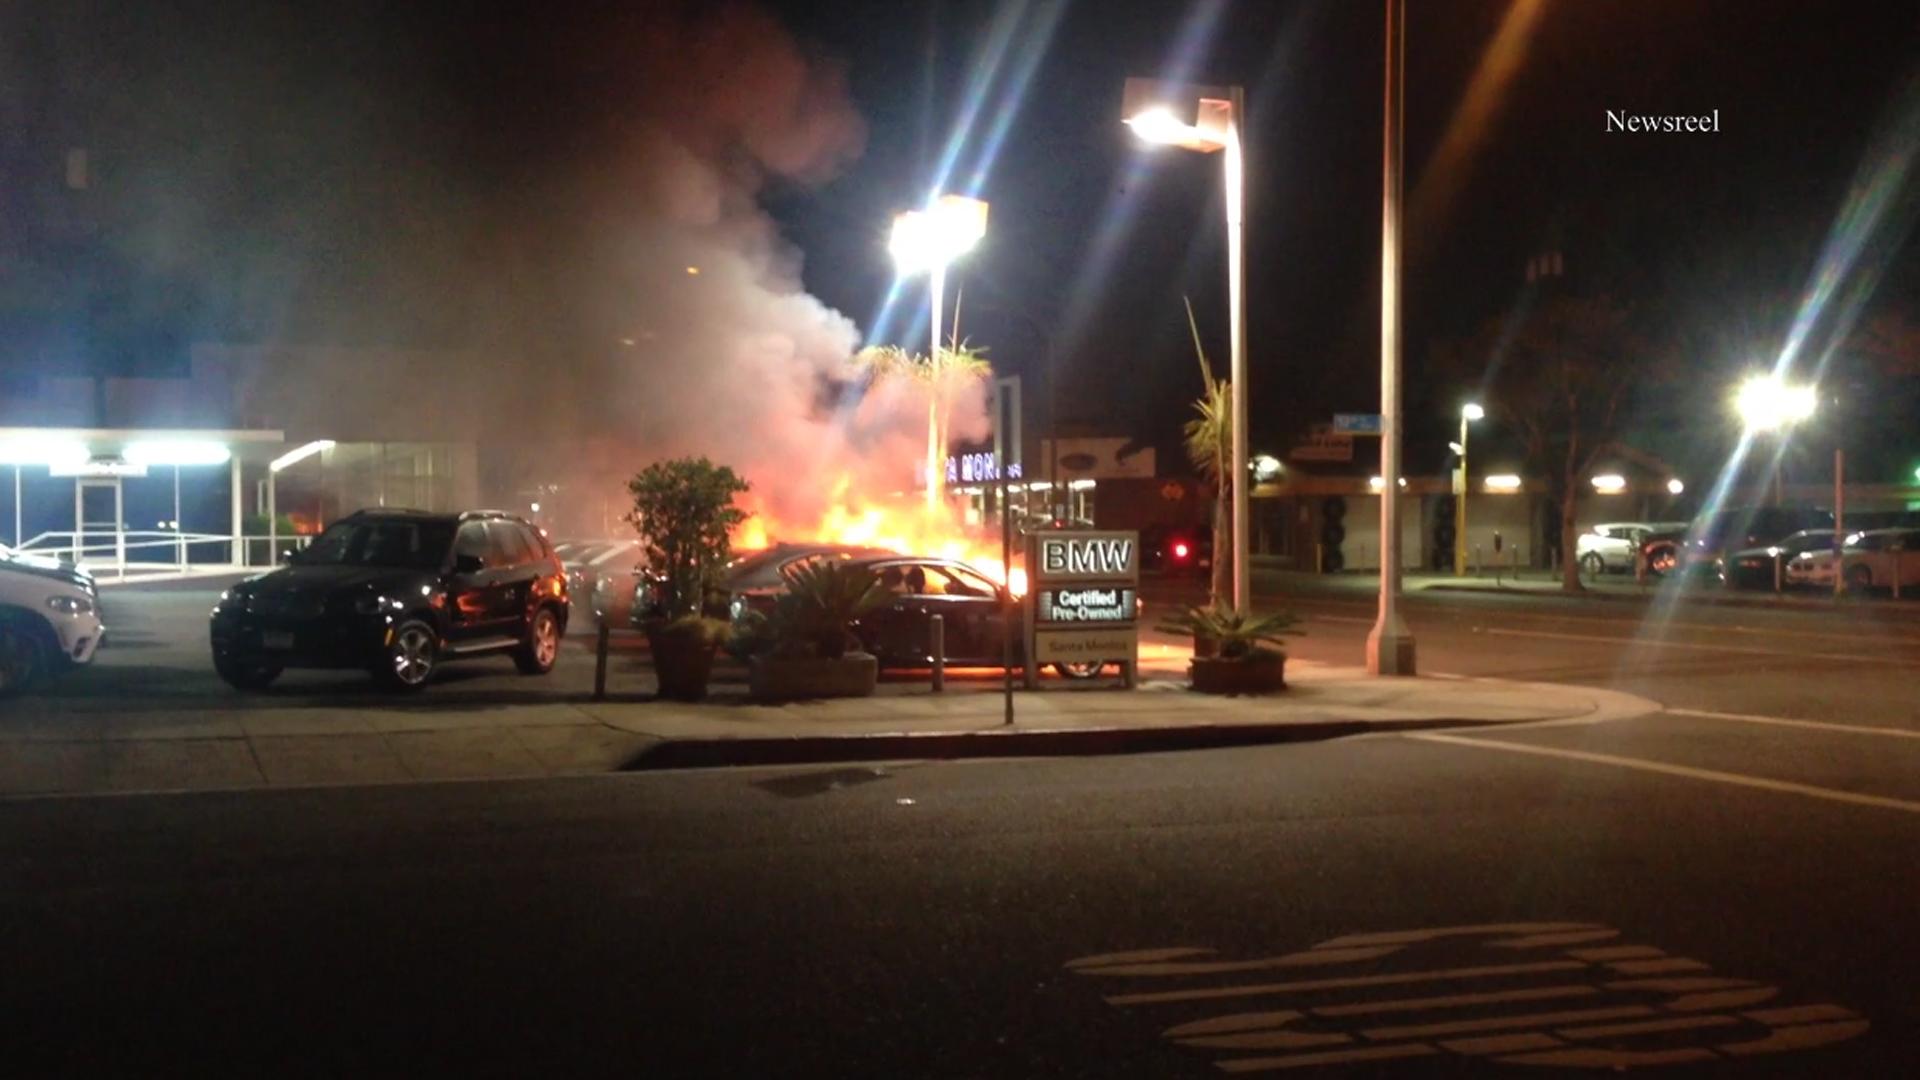 Bmw Dealership In Santa Monica Loses Cars To Apparent Arson Witnesses Described Fire Setter Ktla